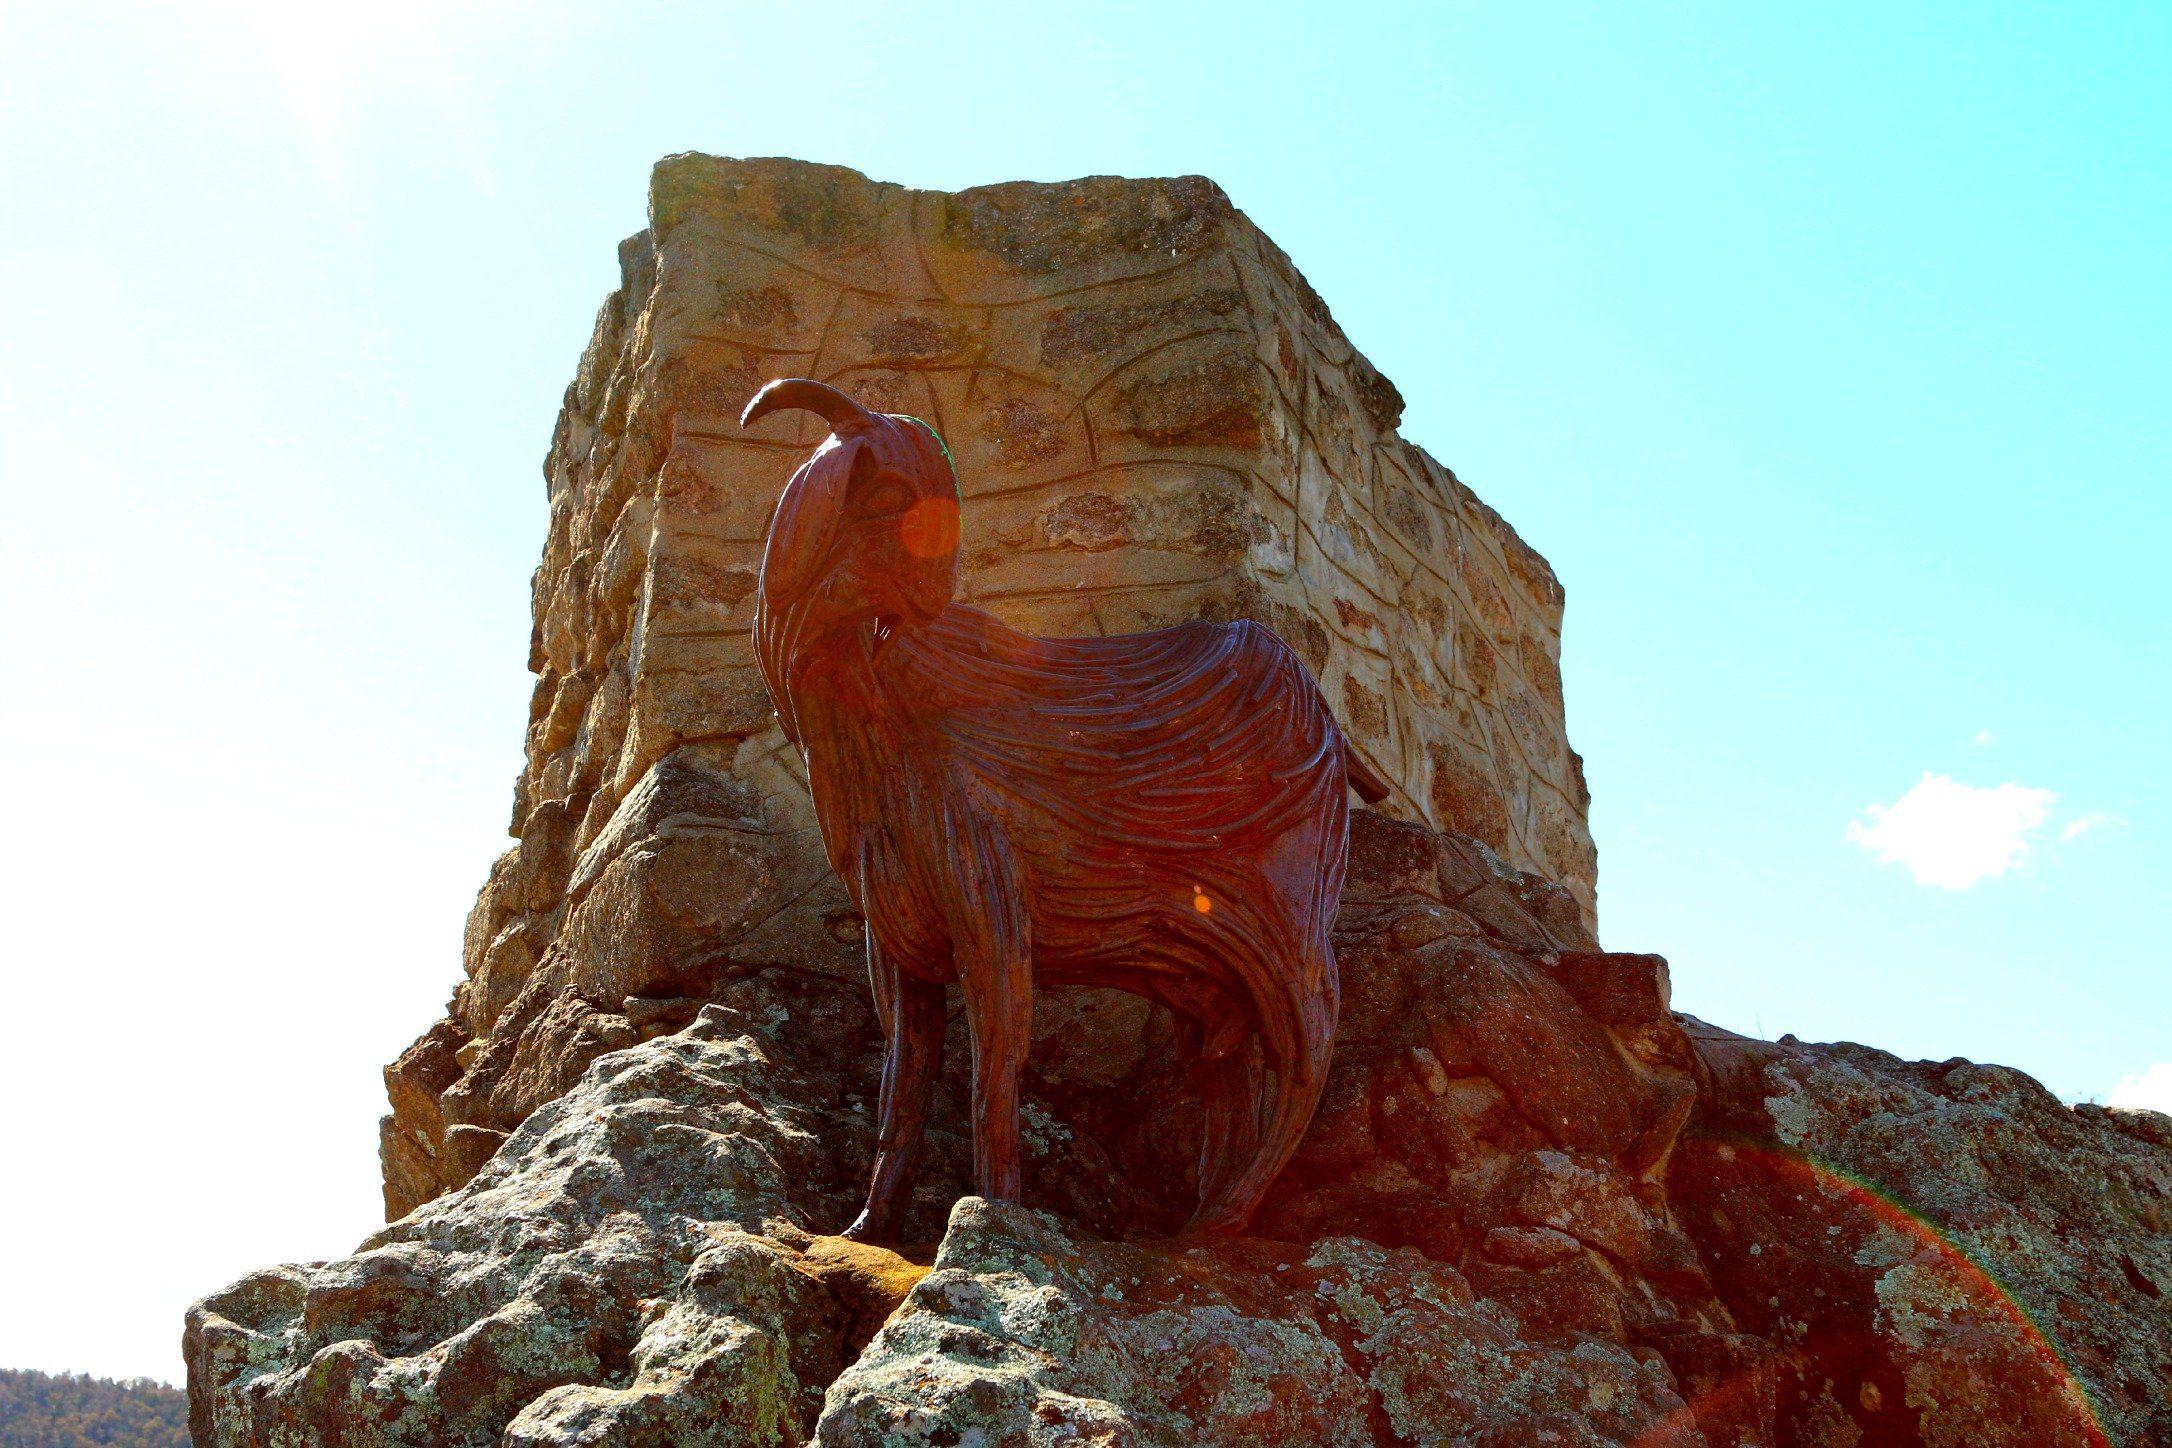 Nanny Goat Hill in Cooma, Australia